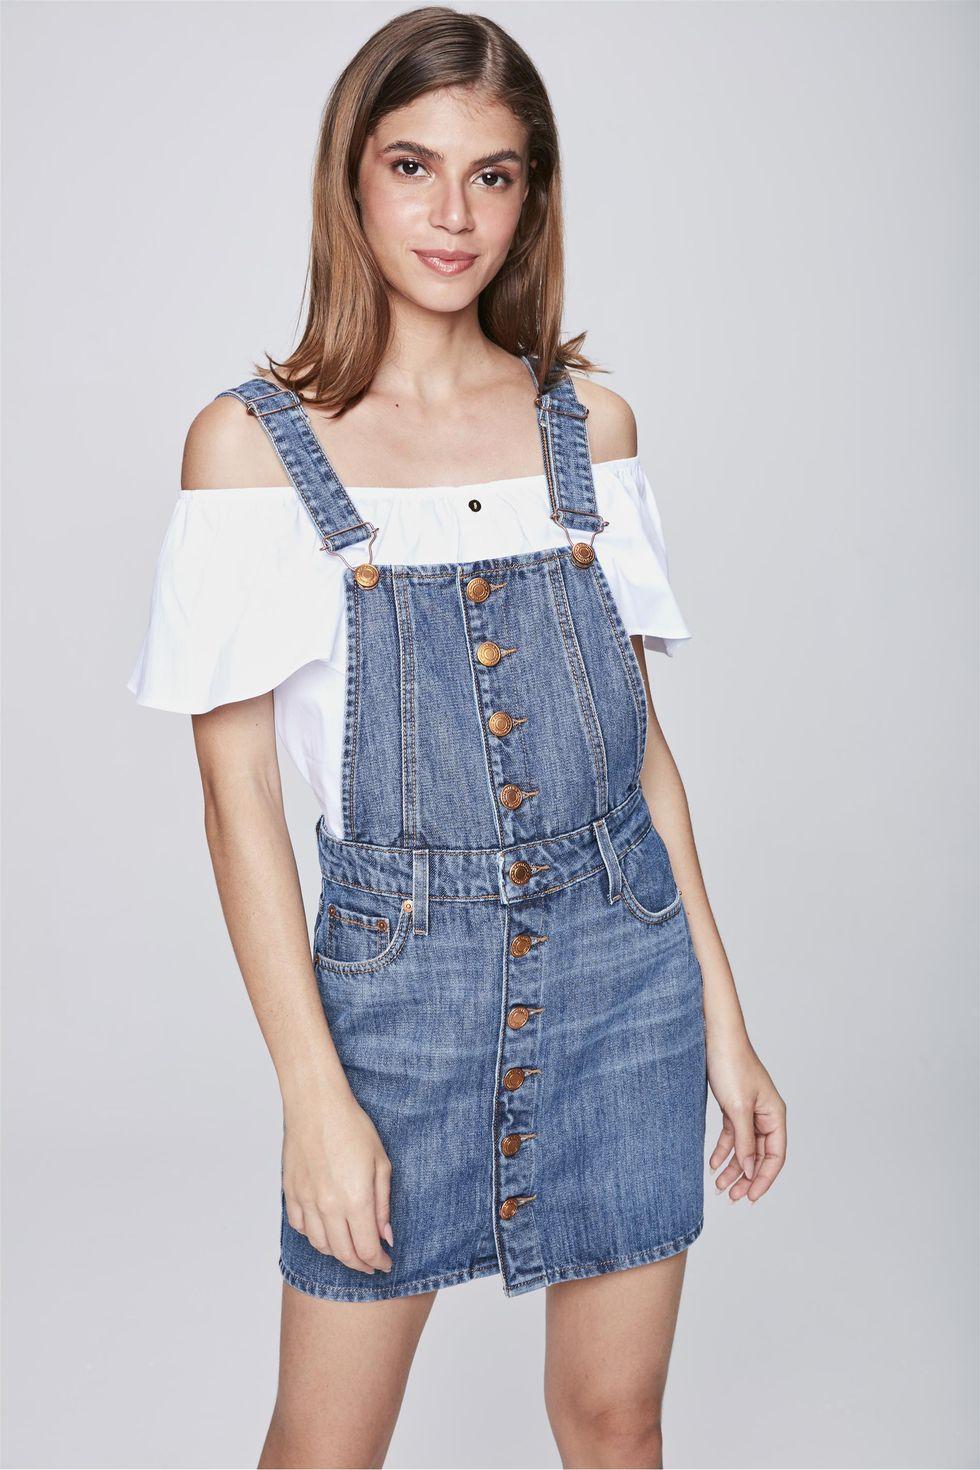 Jardineira-Jeans-Saia-Frente--